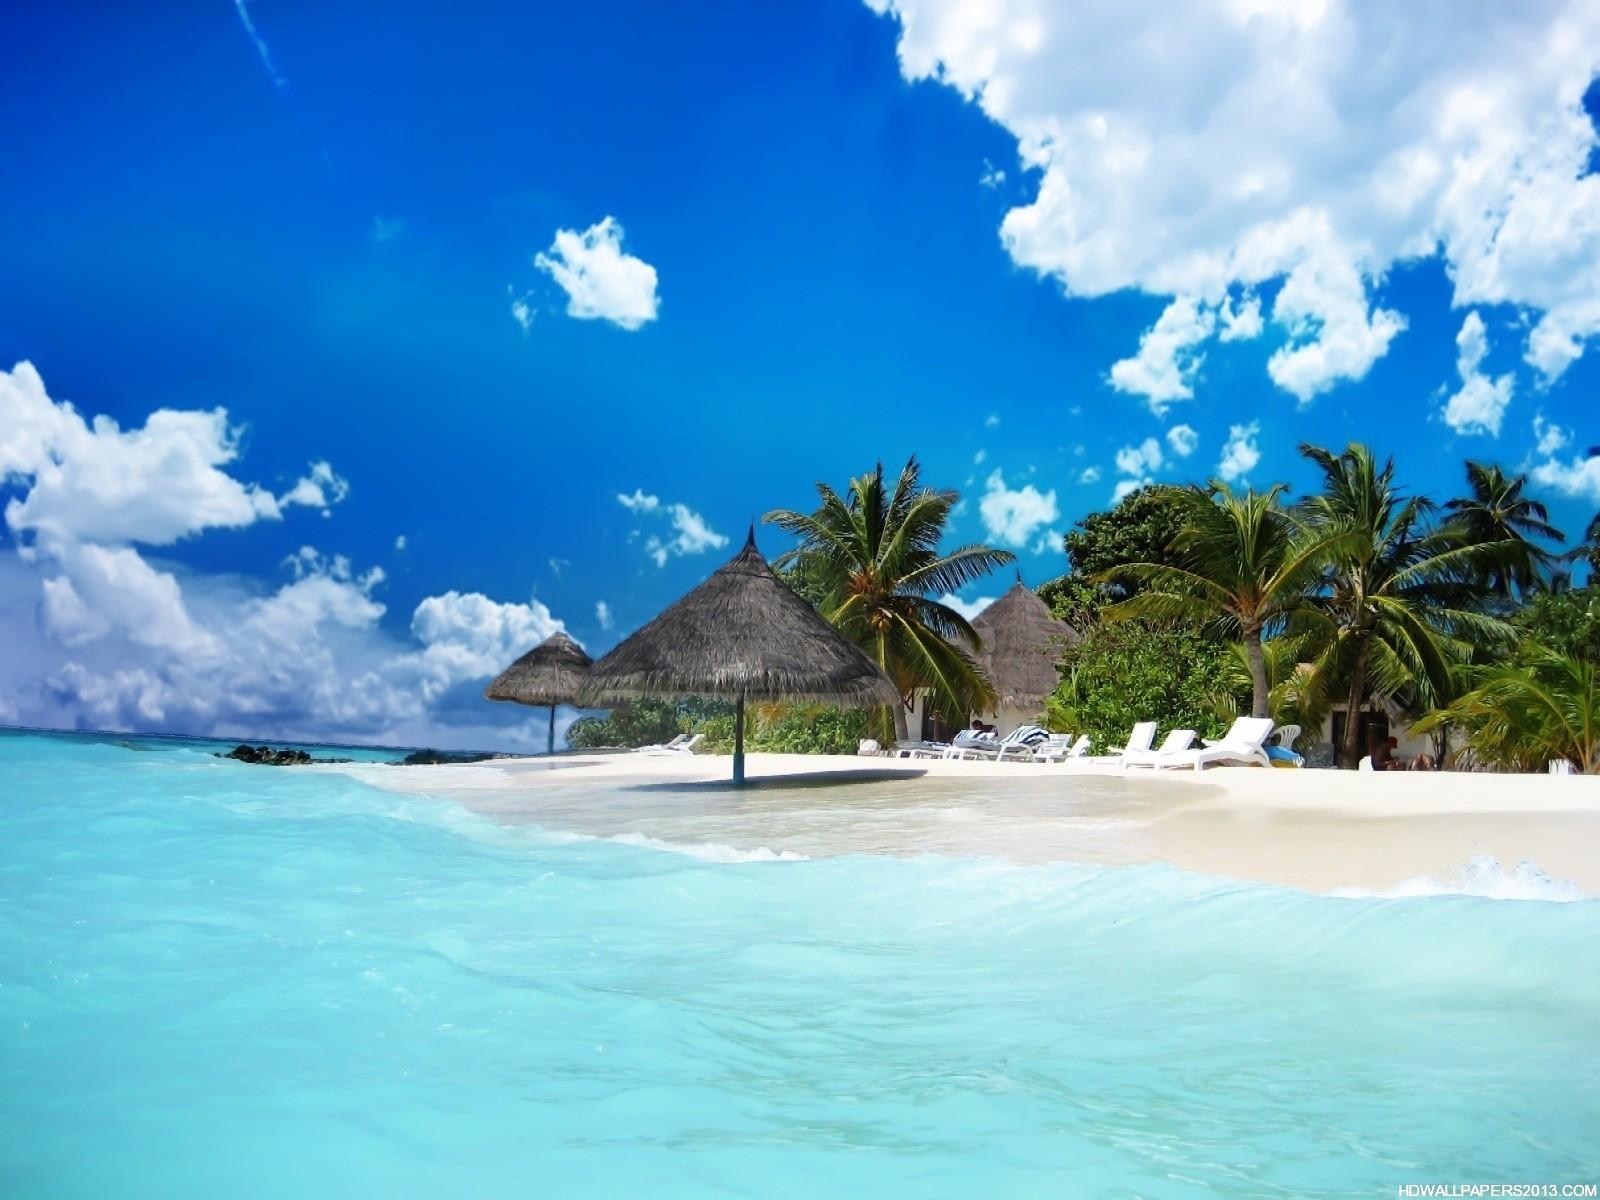 Free Beach Wallpaper | High Definition Wallpapers, High Definition ...